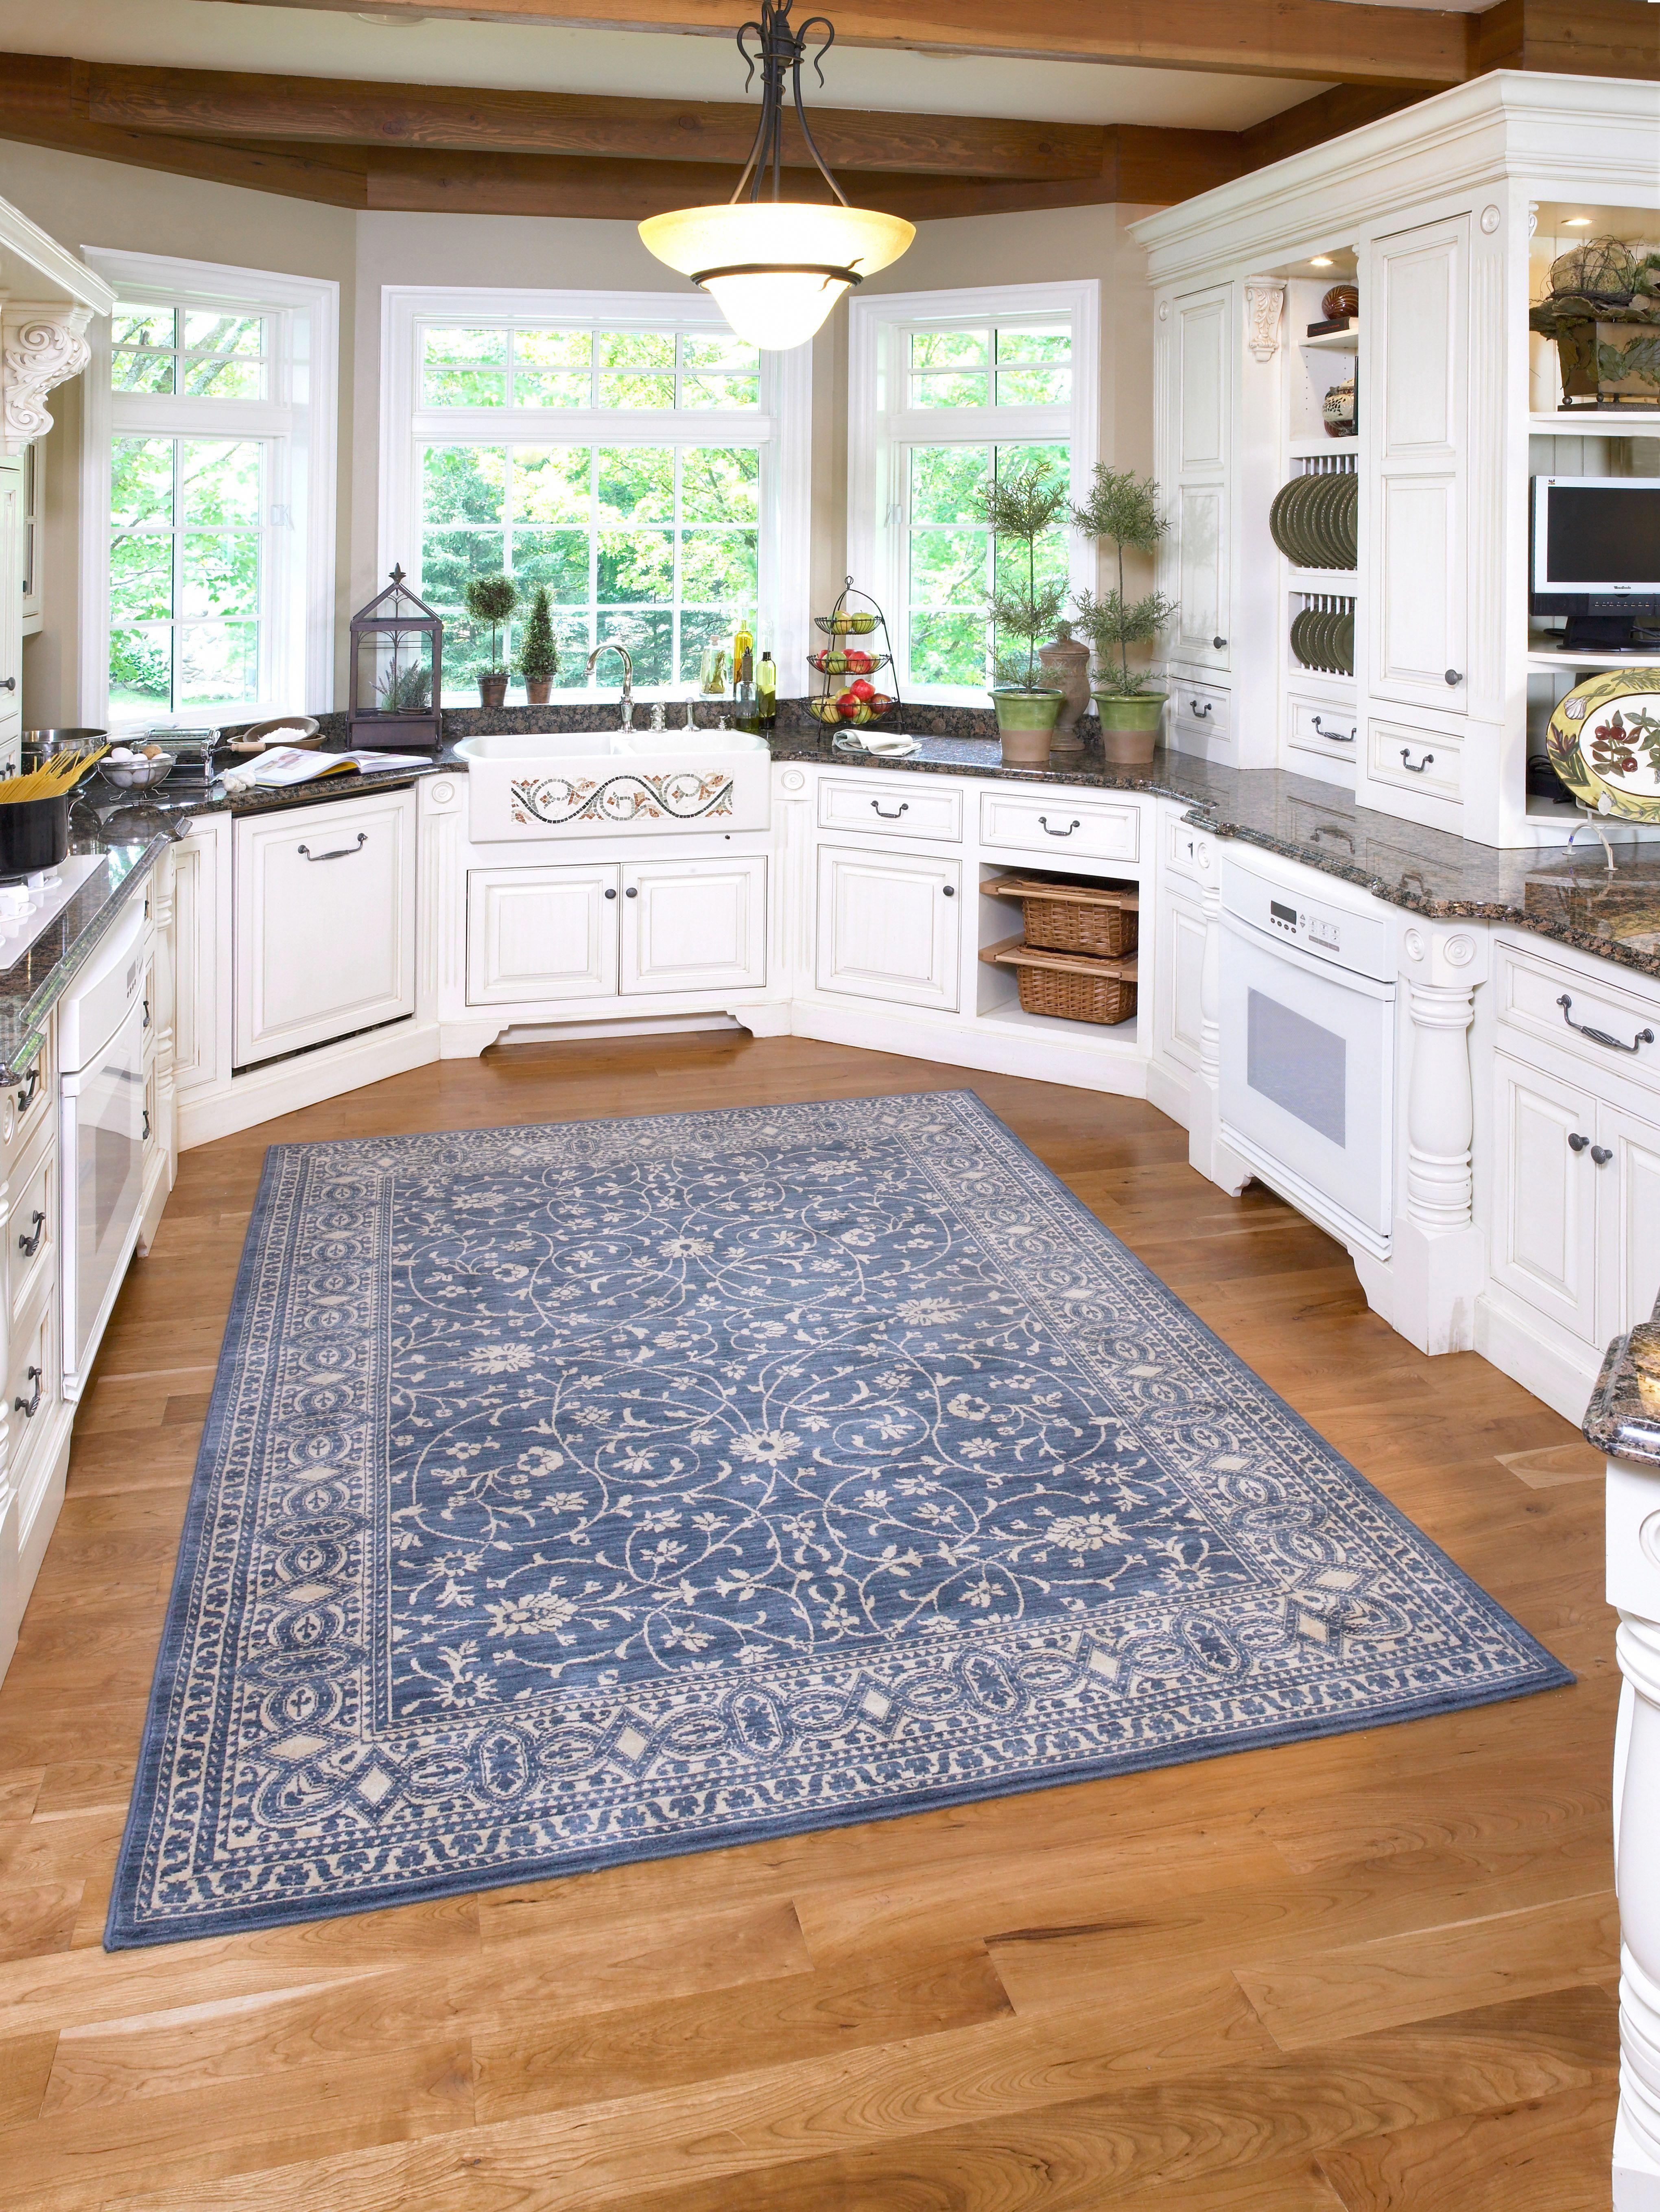 Area Rug In Kitchen Discountcarpetsnearme Large Kitchen Rugs Kitchen Area Rugs Kitchen Rug Large kitchen area rugs